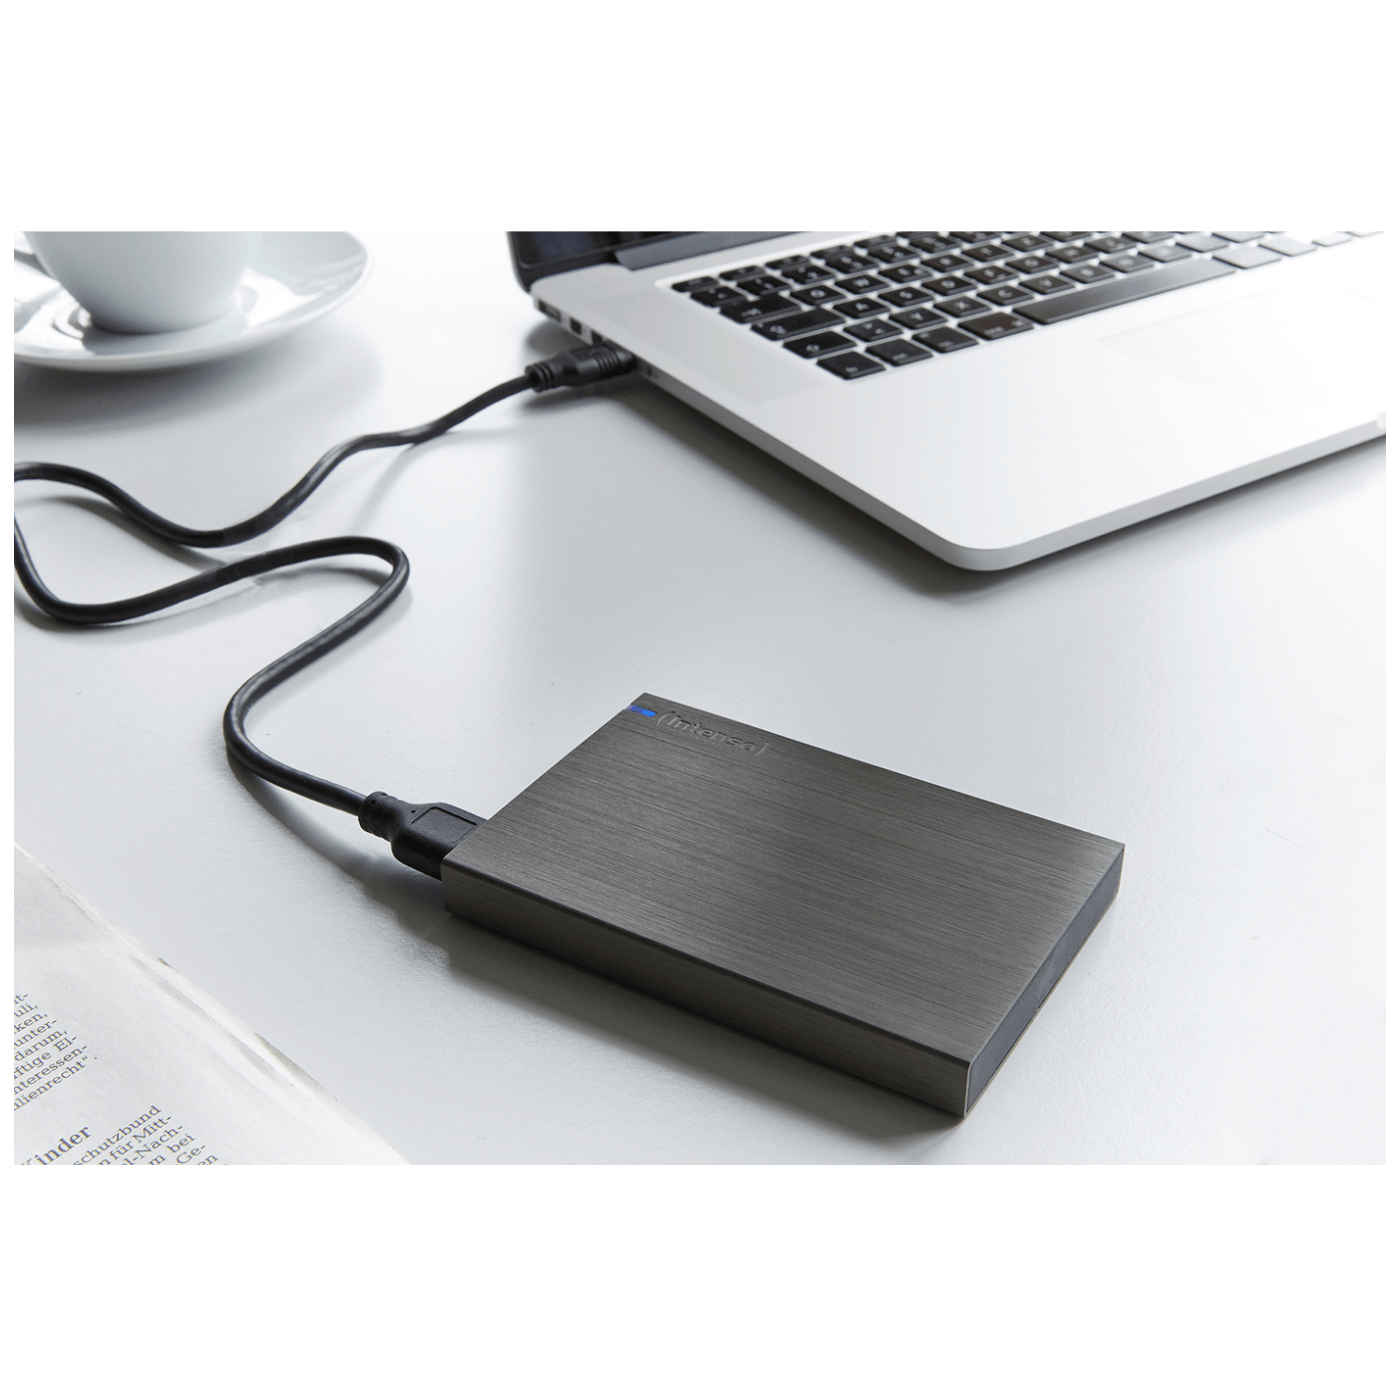 HDD3.0-2TB/Memory Board